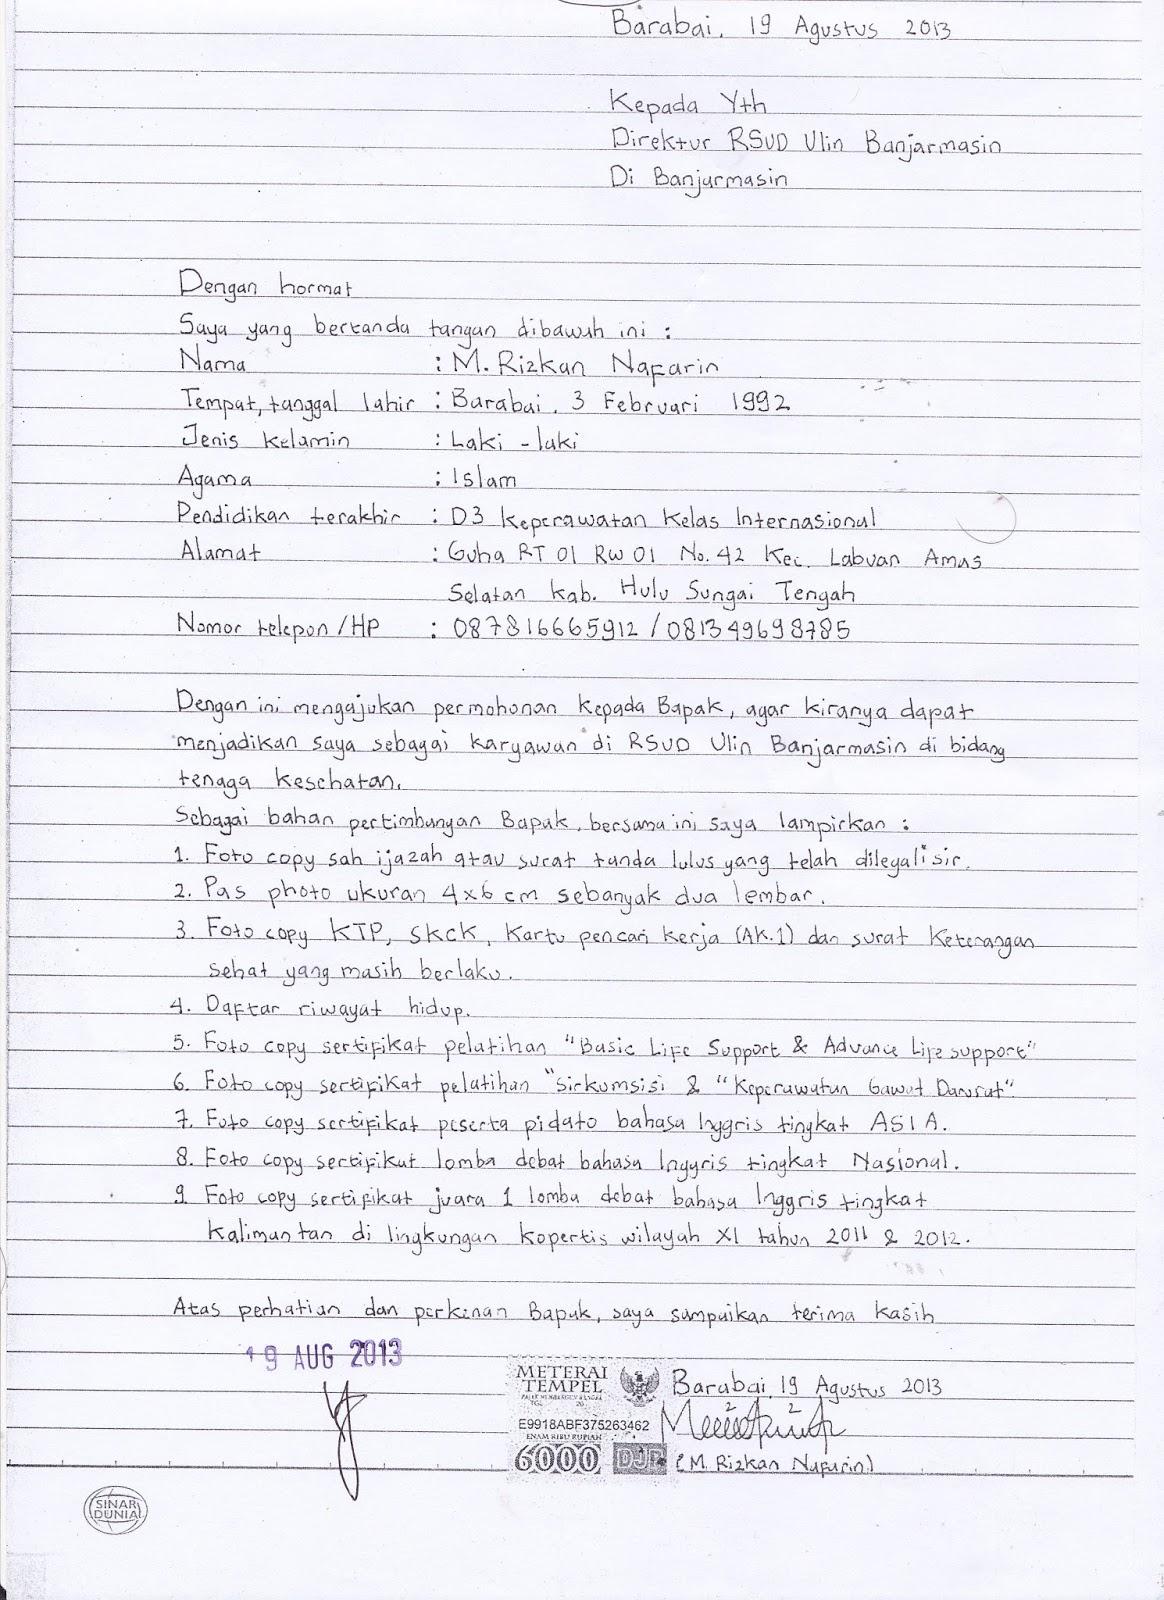 Contoh Surat Lamaran Kerja Yang Baik Dan Benar Di Kertas Folio Contoh Seputar Surat